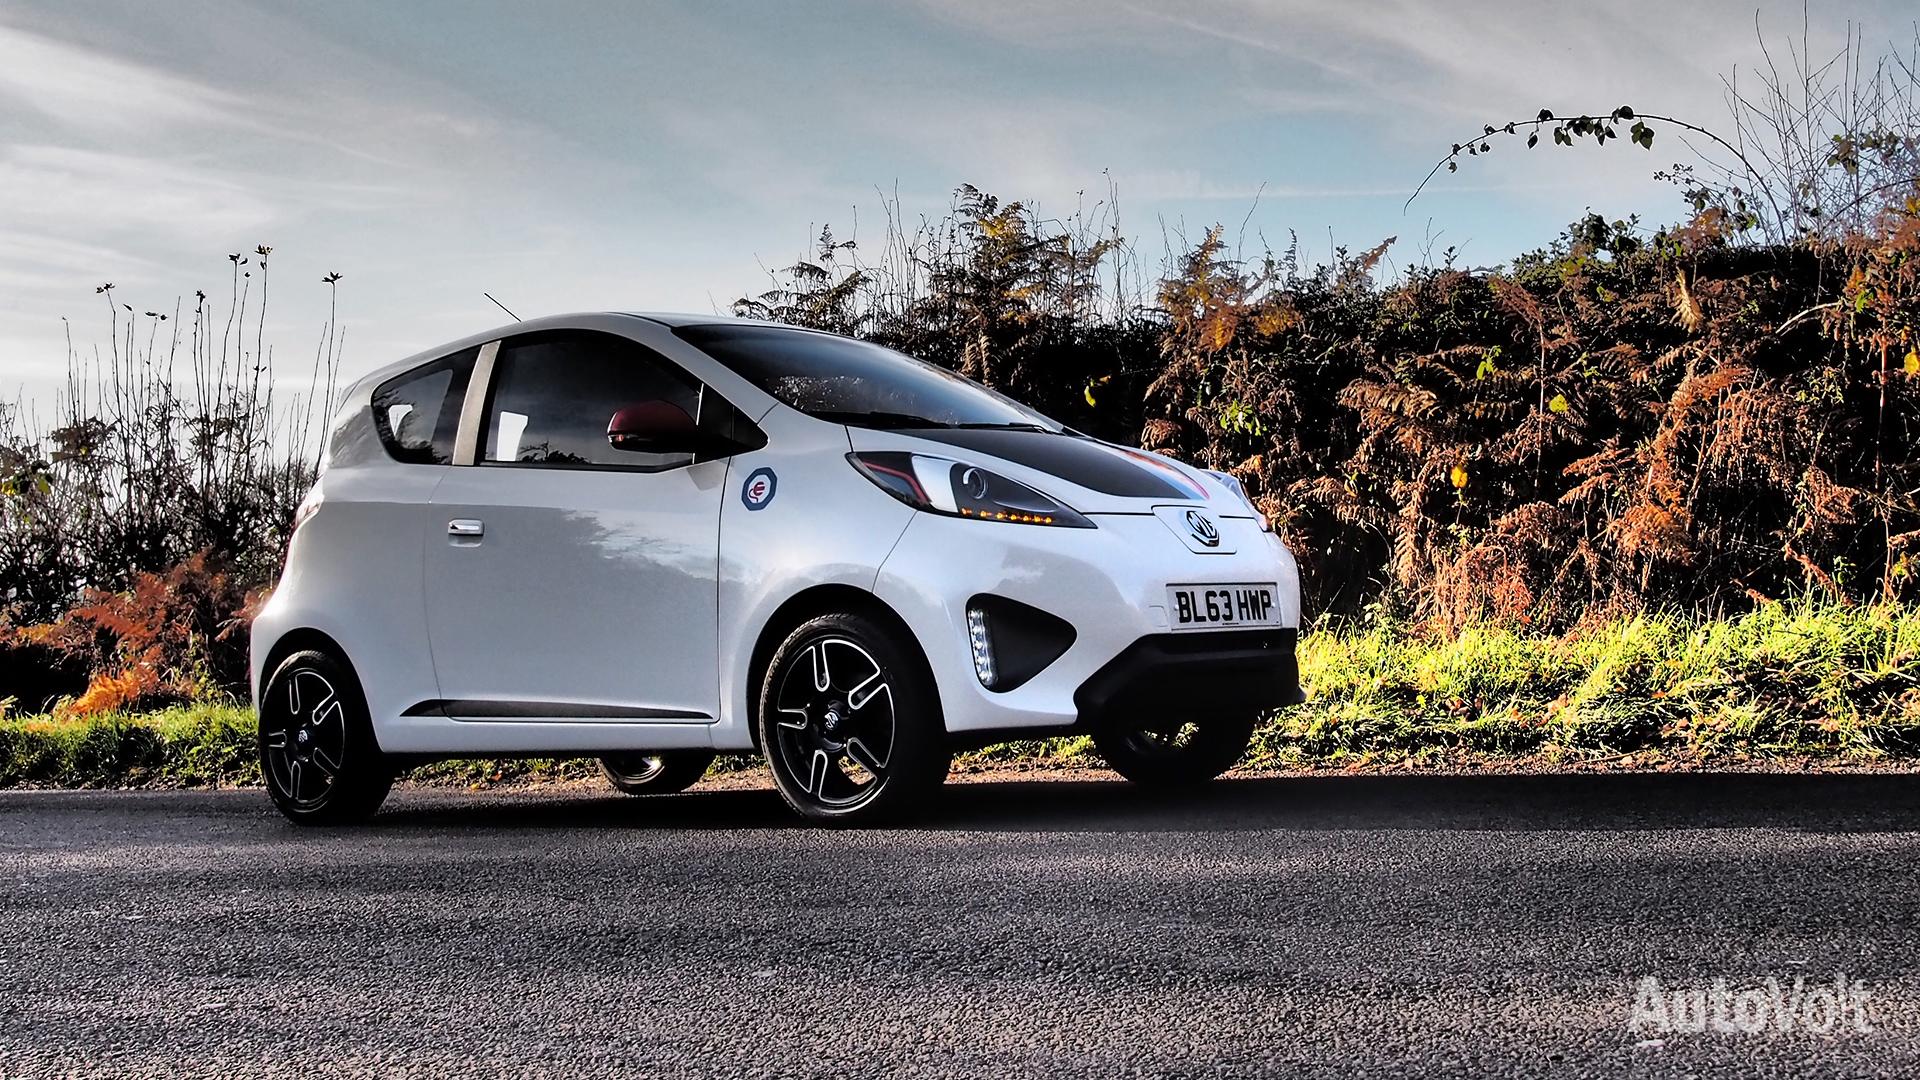 MG Concept EV Photo